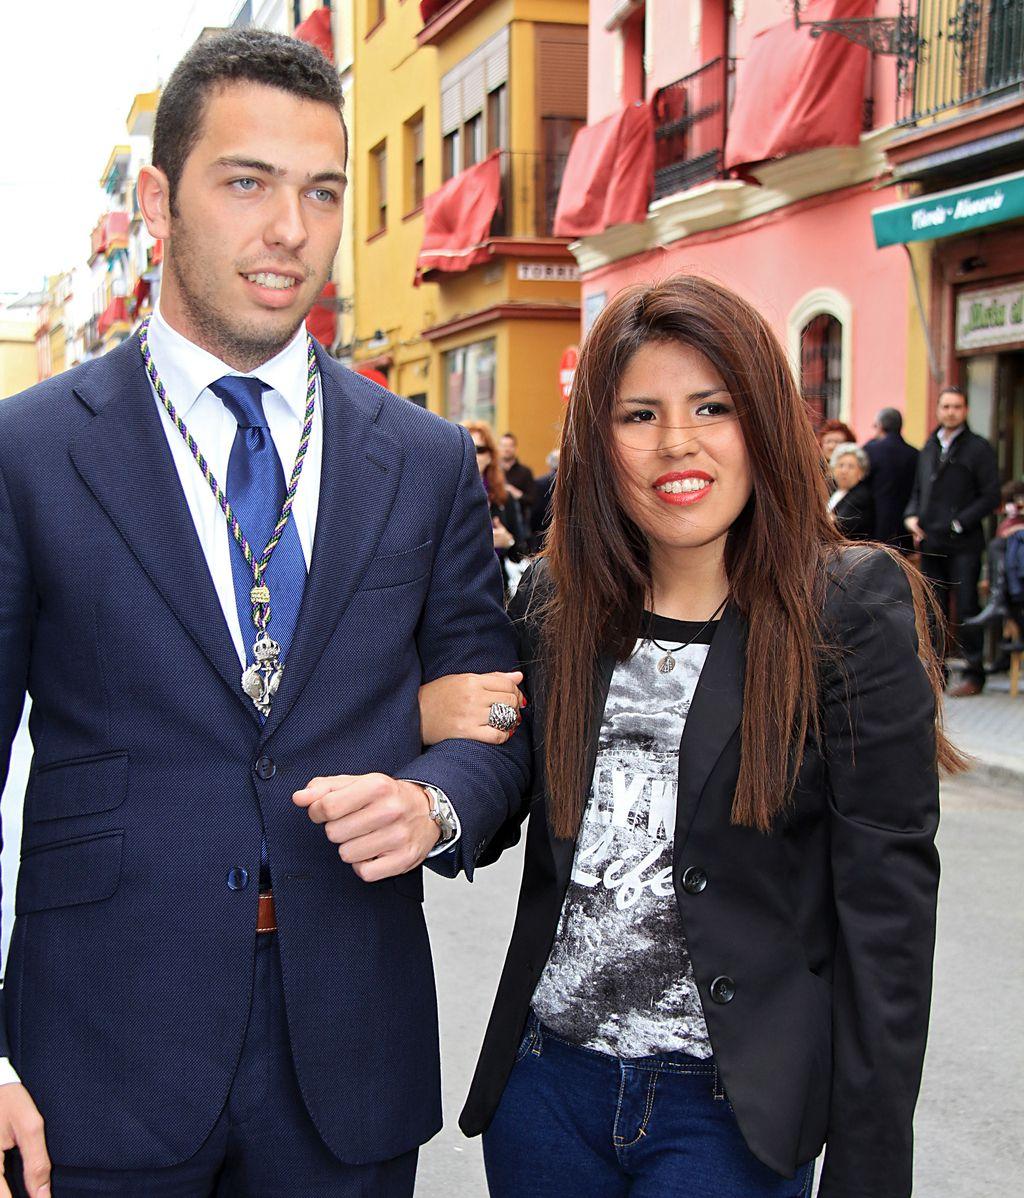 Alberto Isla y Chabelita